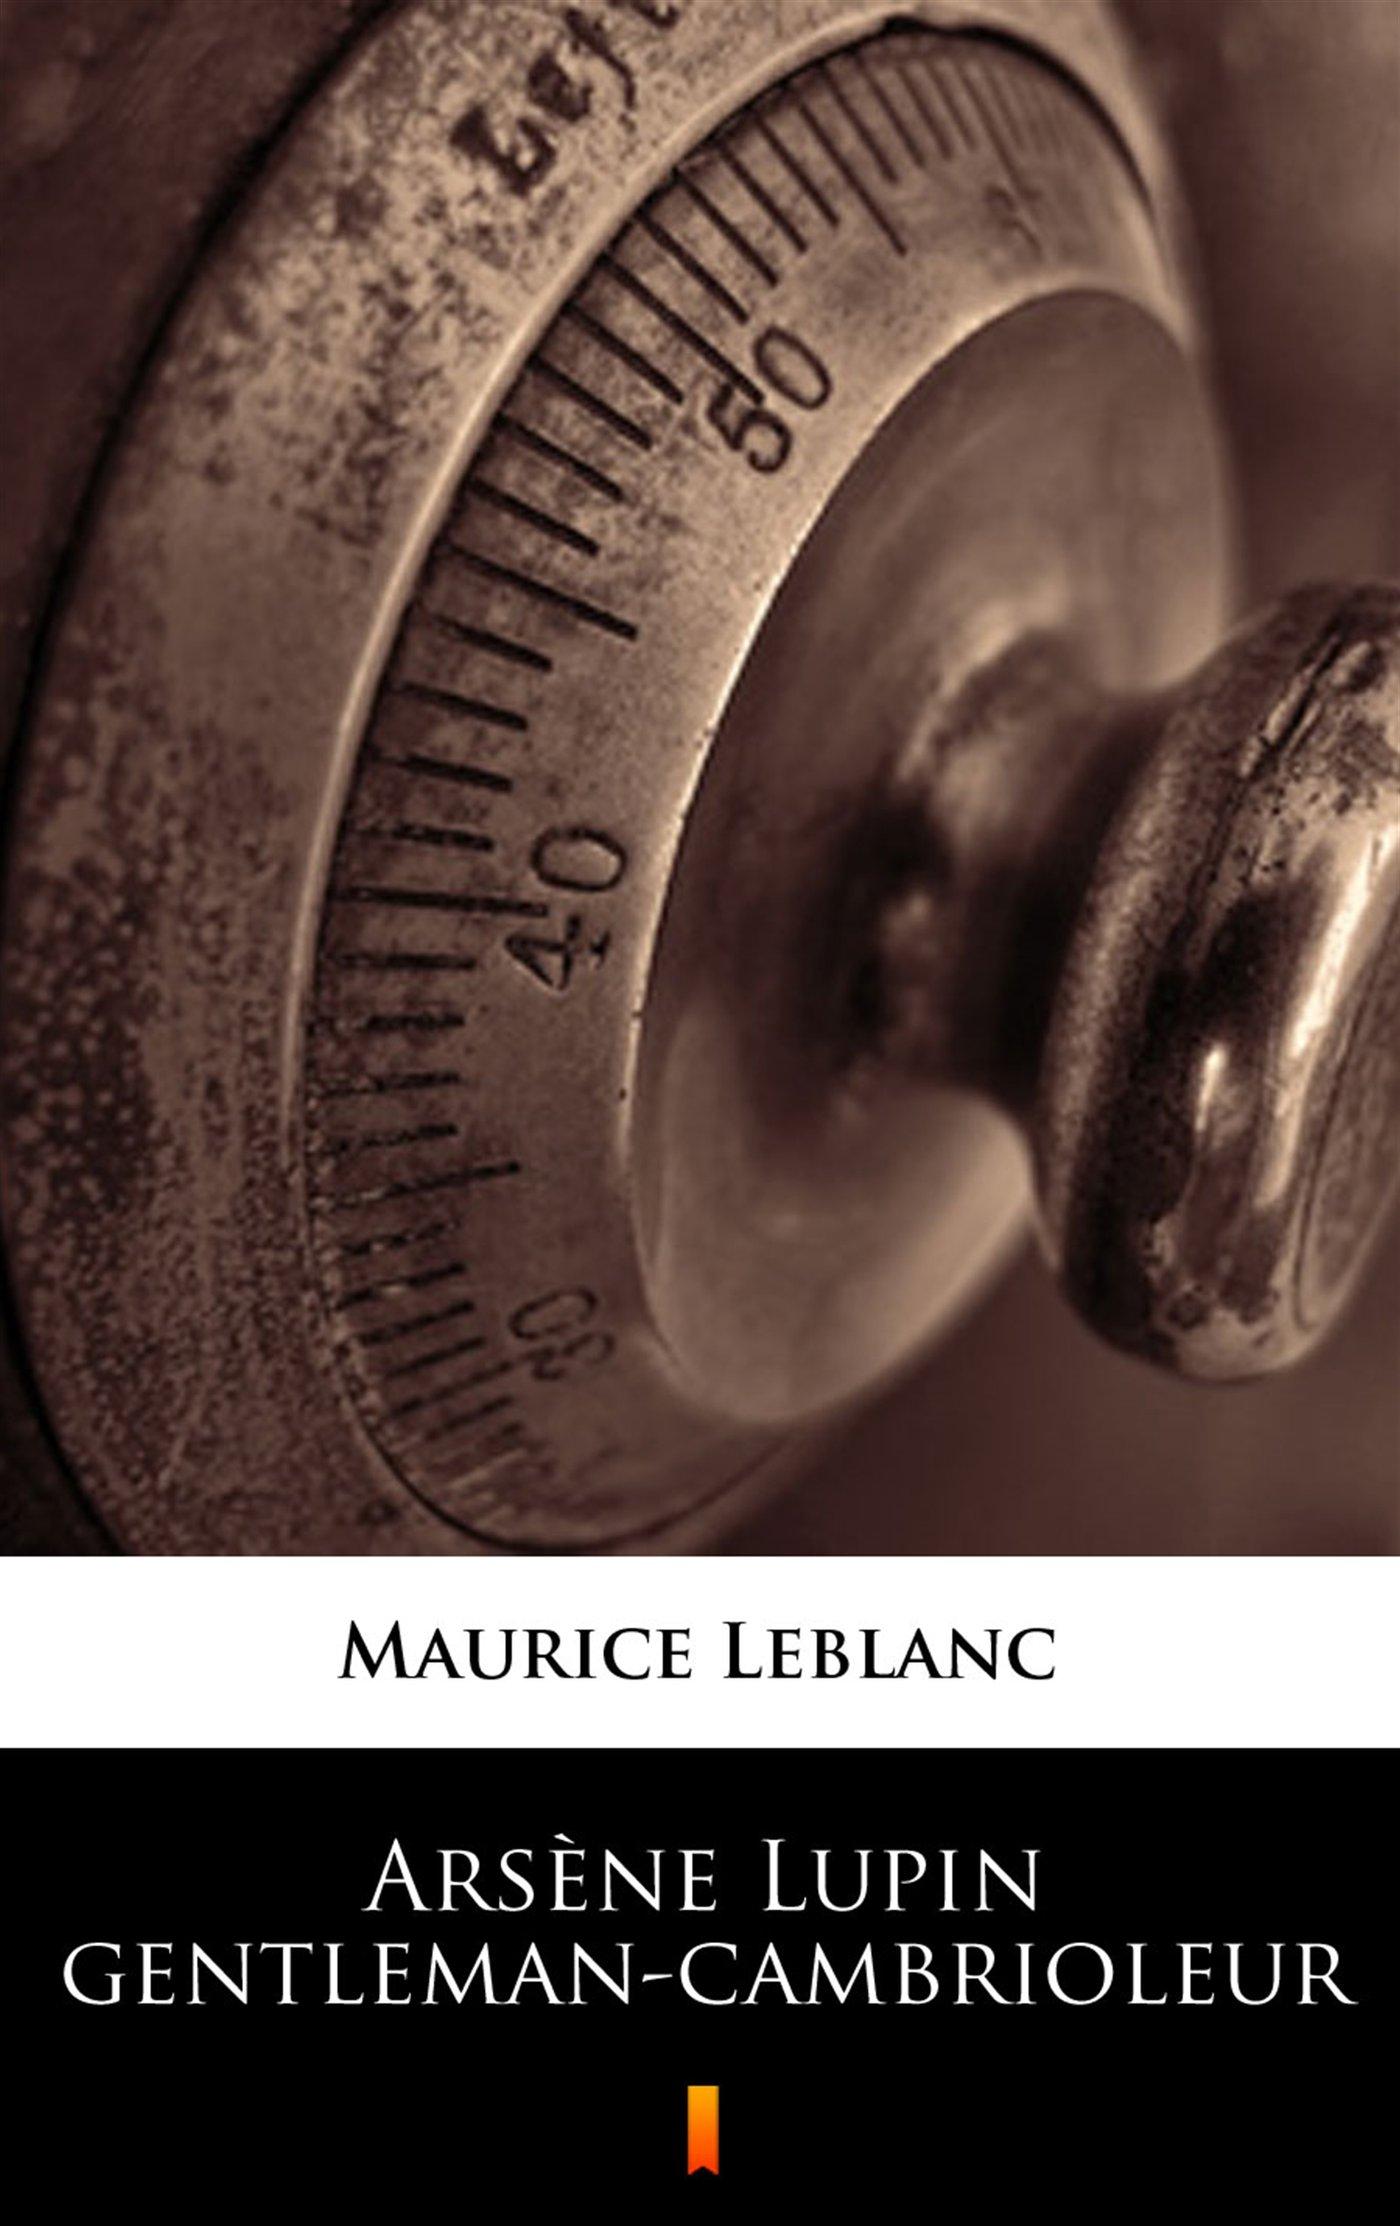 Arsene Lupin gentleman-cambrioleur - Ebook (Książka na Kindle) do pobrania w formacie MOBI